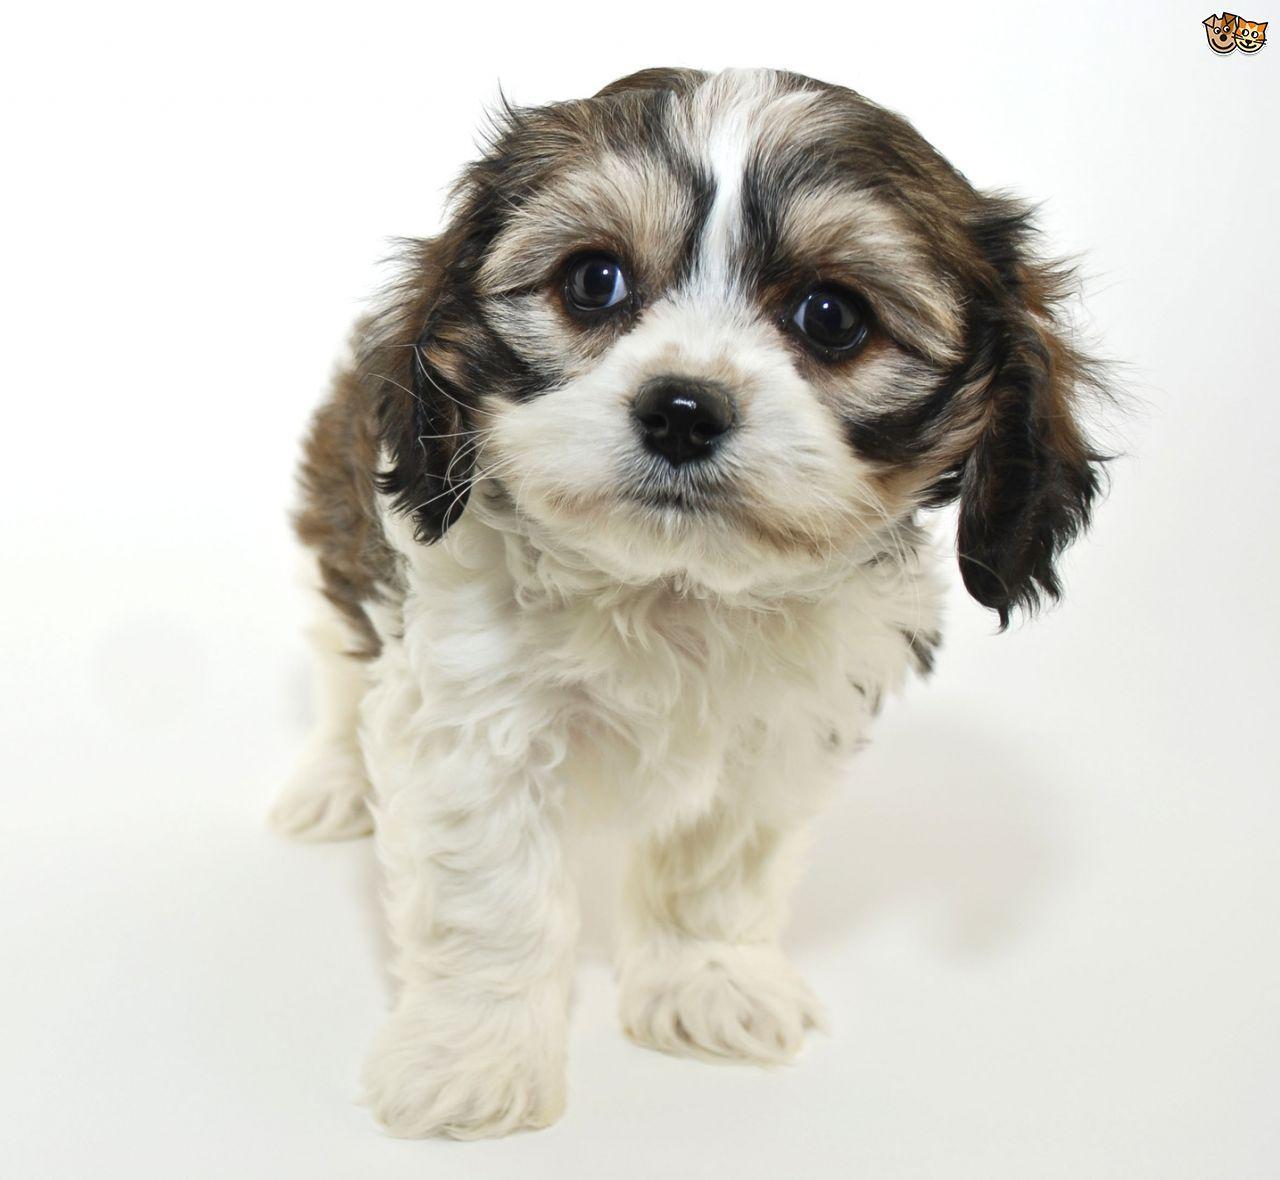 All About The Cavachon Dog Pets4homes Cavachon Puppies Cavachon Cavachon Dog